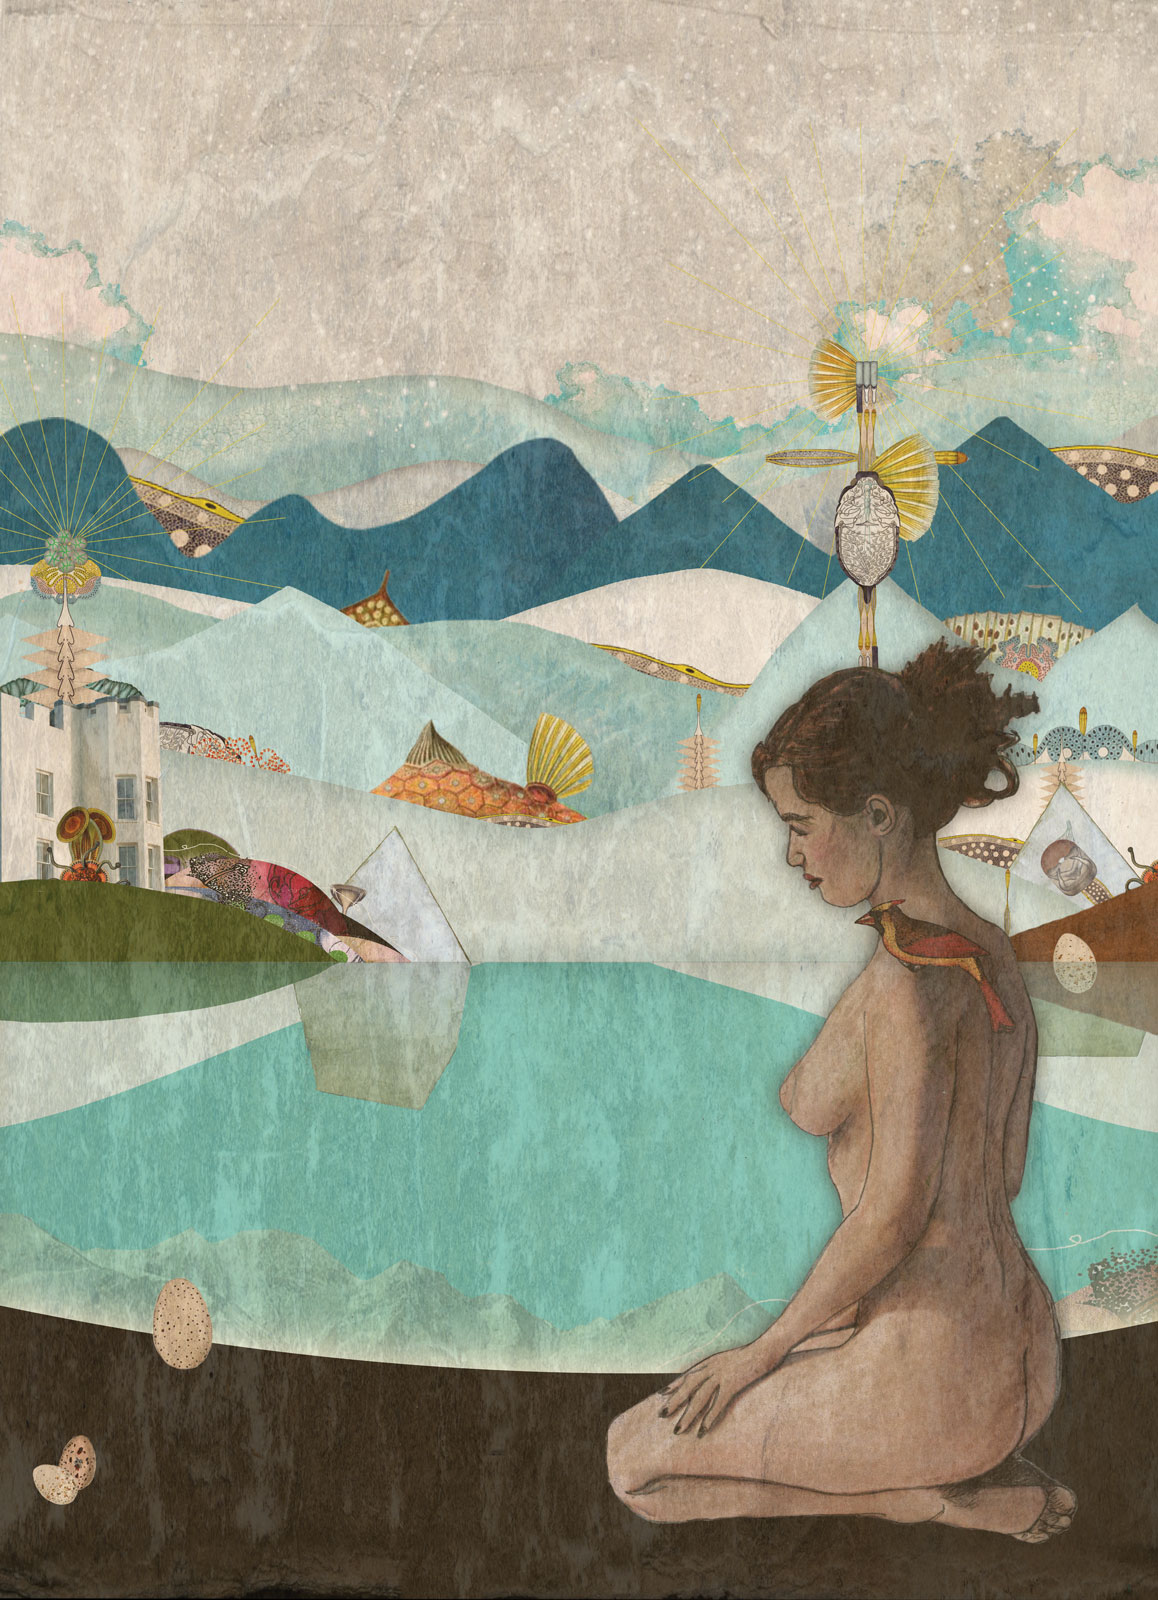 <i>Nadine Edeltraud Achen Baader's revelation</i>